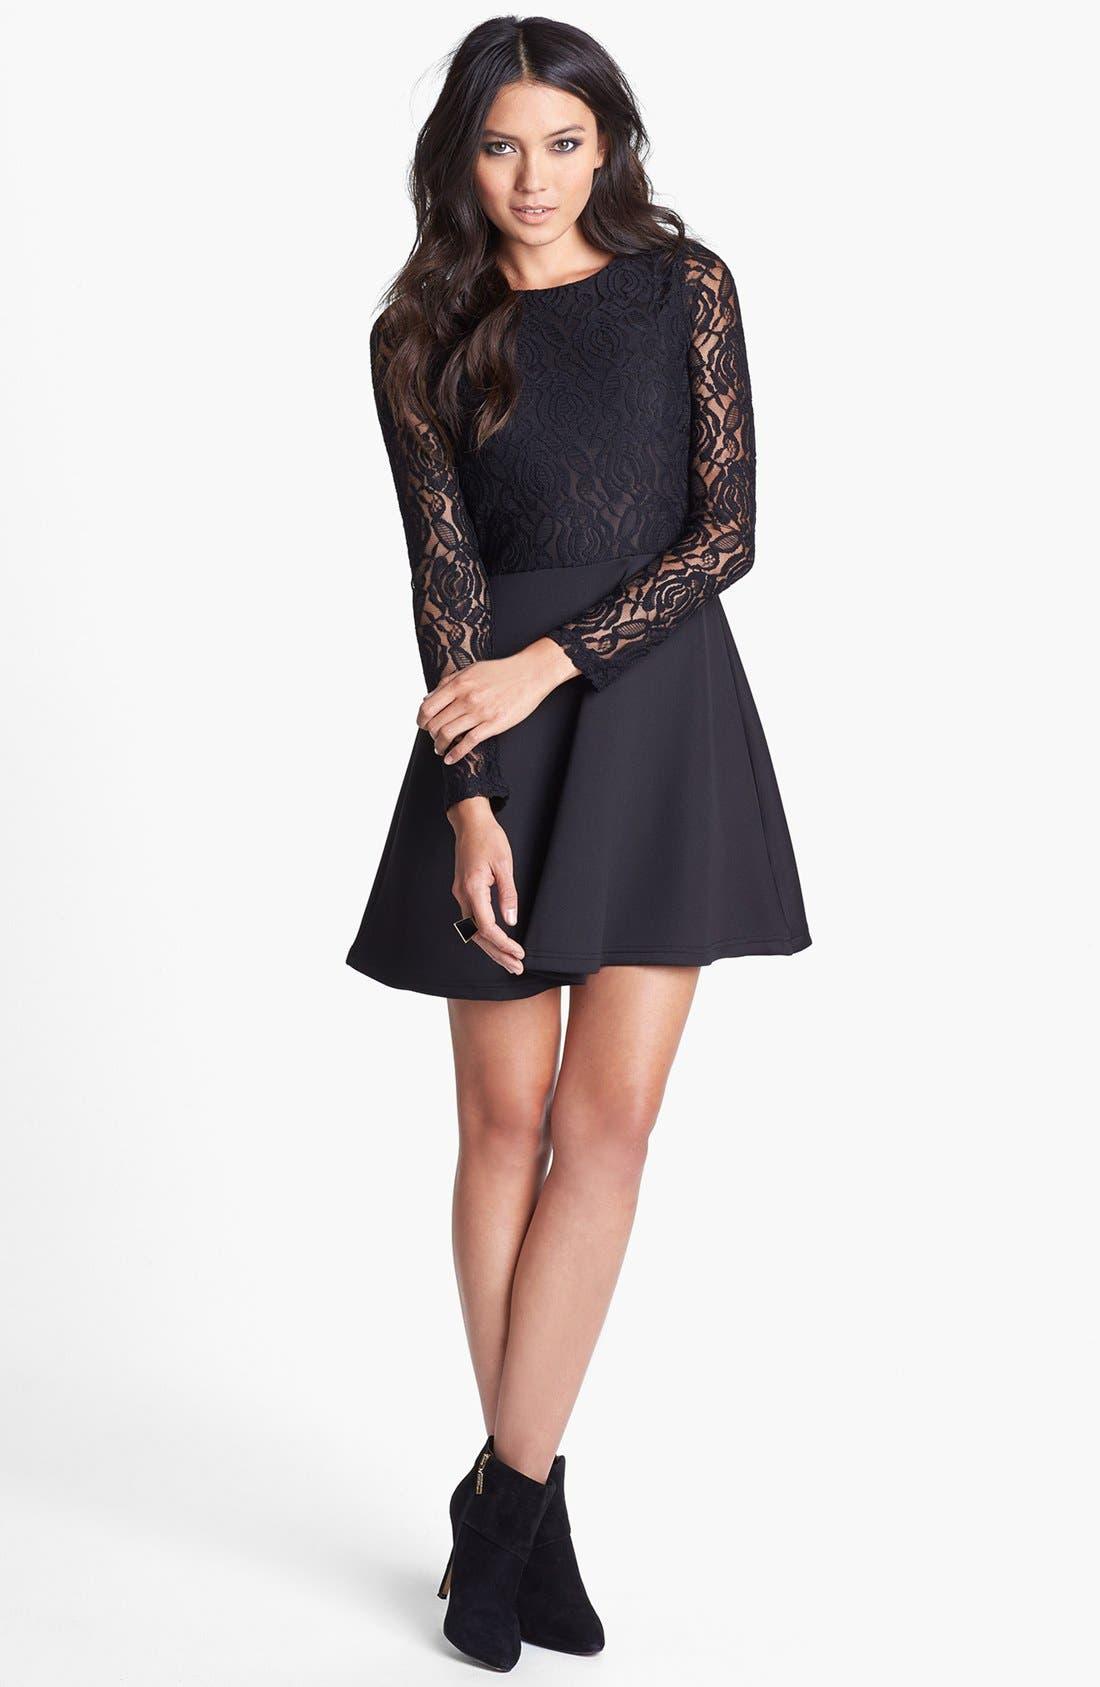 Alternate Image 1 Selected - Glamorous Lace Bodice Open Back Skater Dress